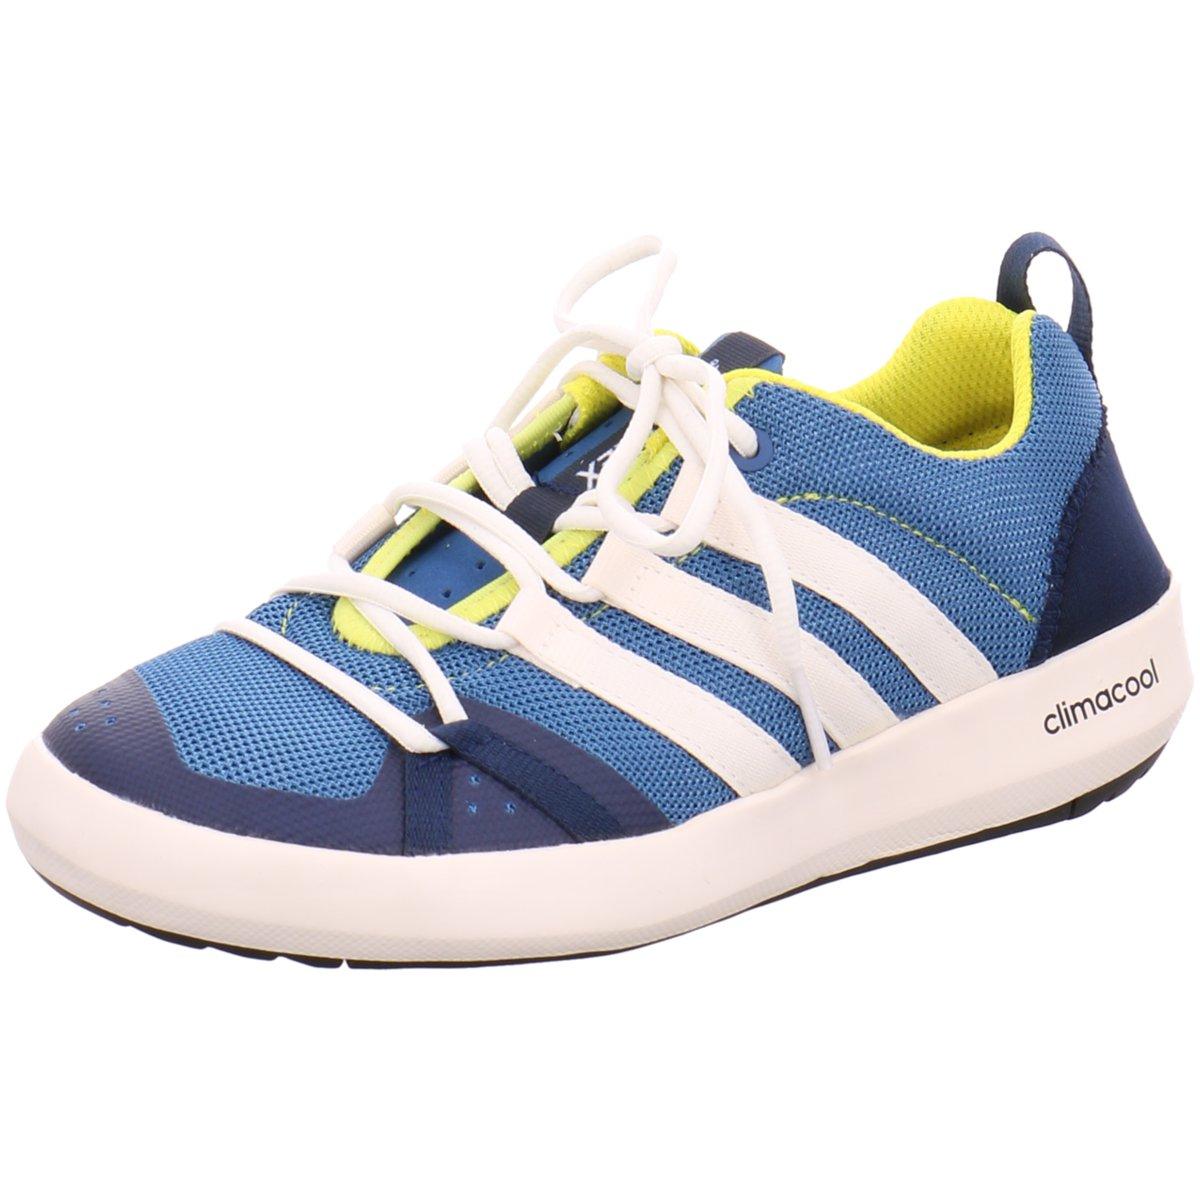 Details zu adidas Herren Sneaker TERREX CC BOAT BB1908 blau 271062